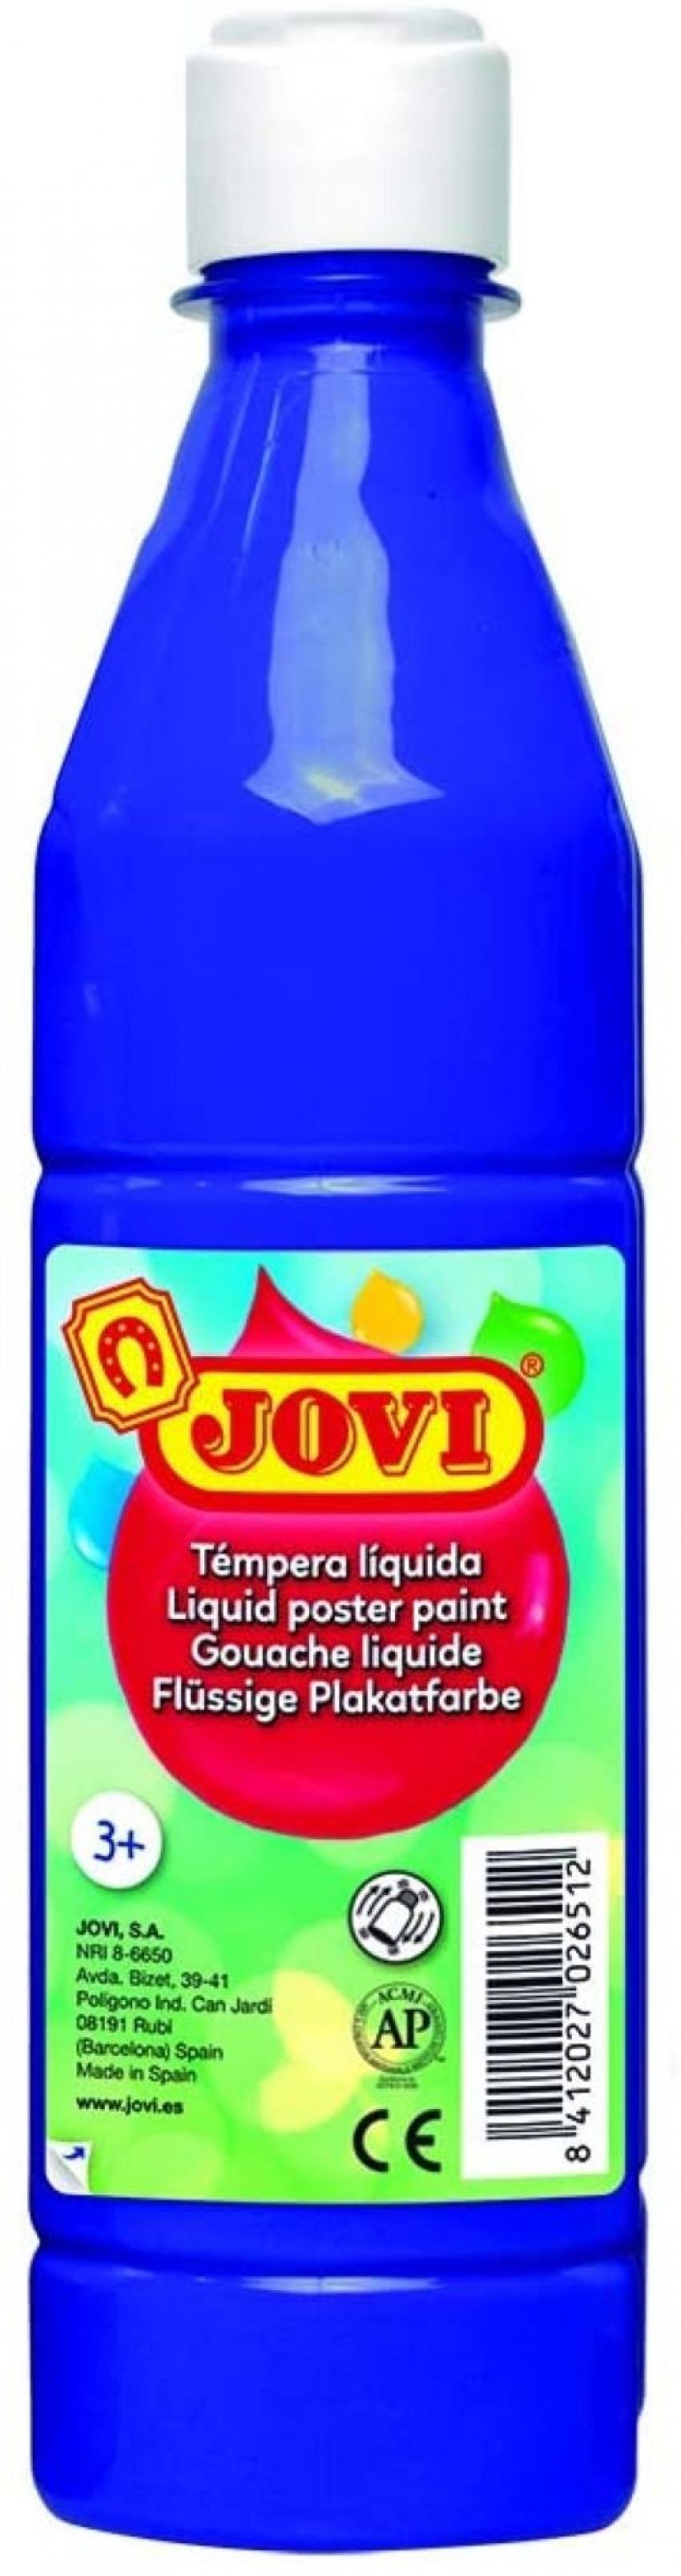 Bote tempera liquida jovi azul ultramar 500 ml 8412027003735